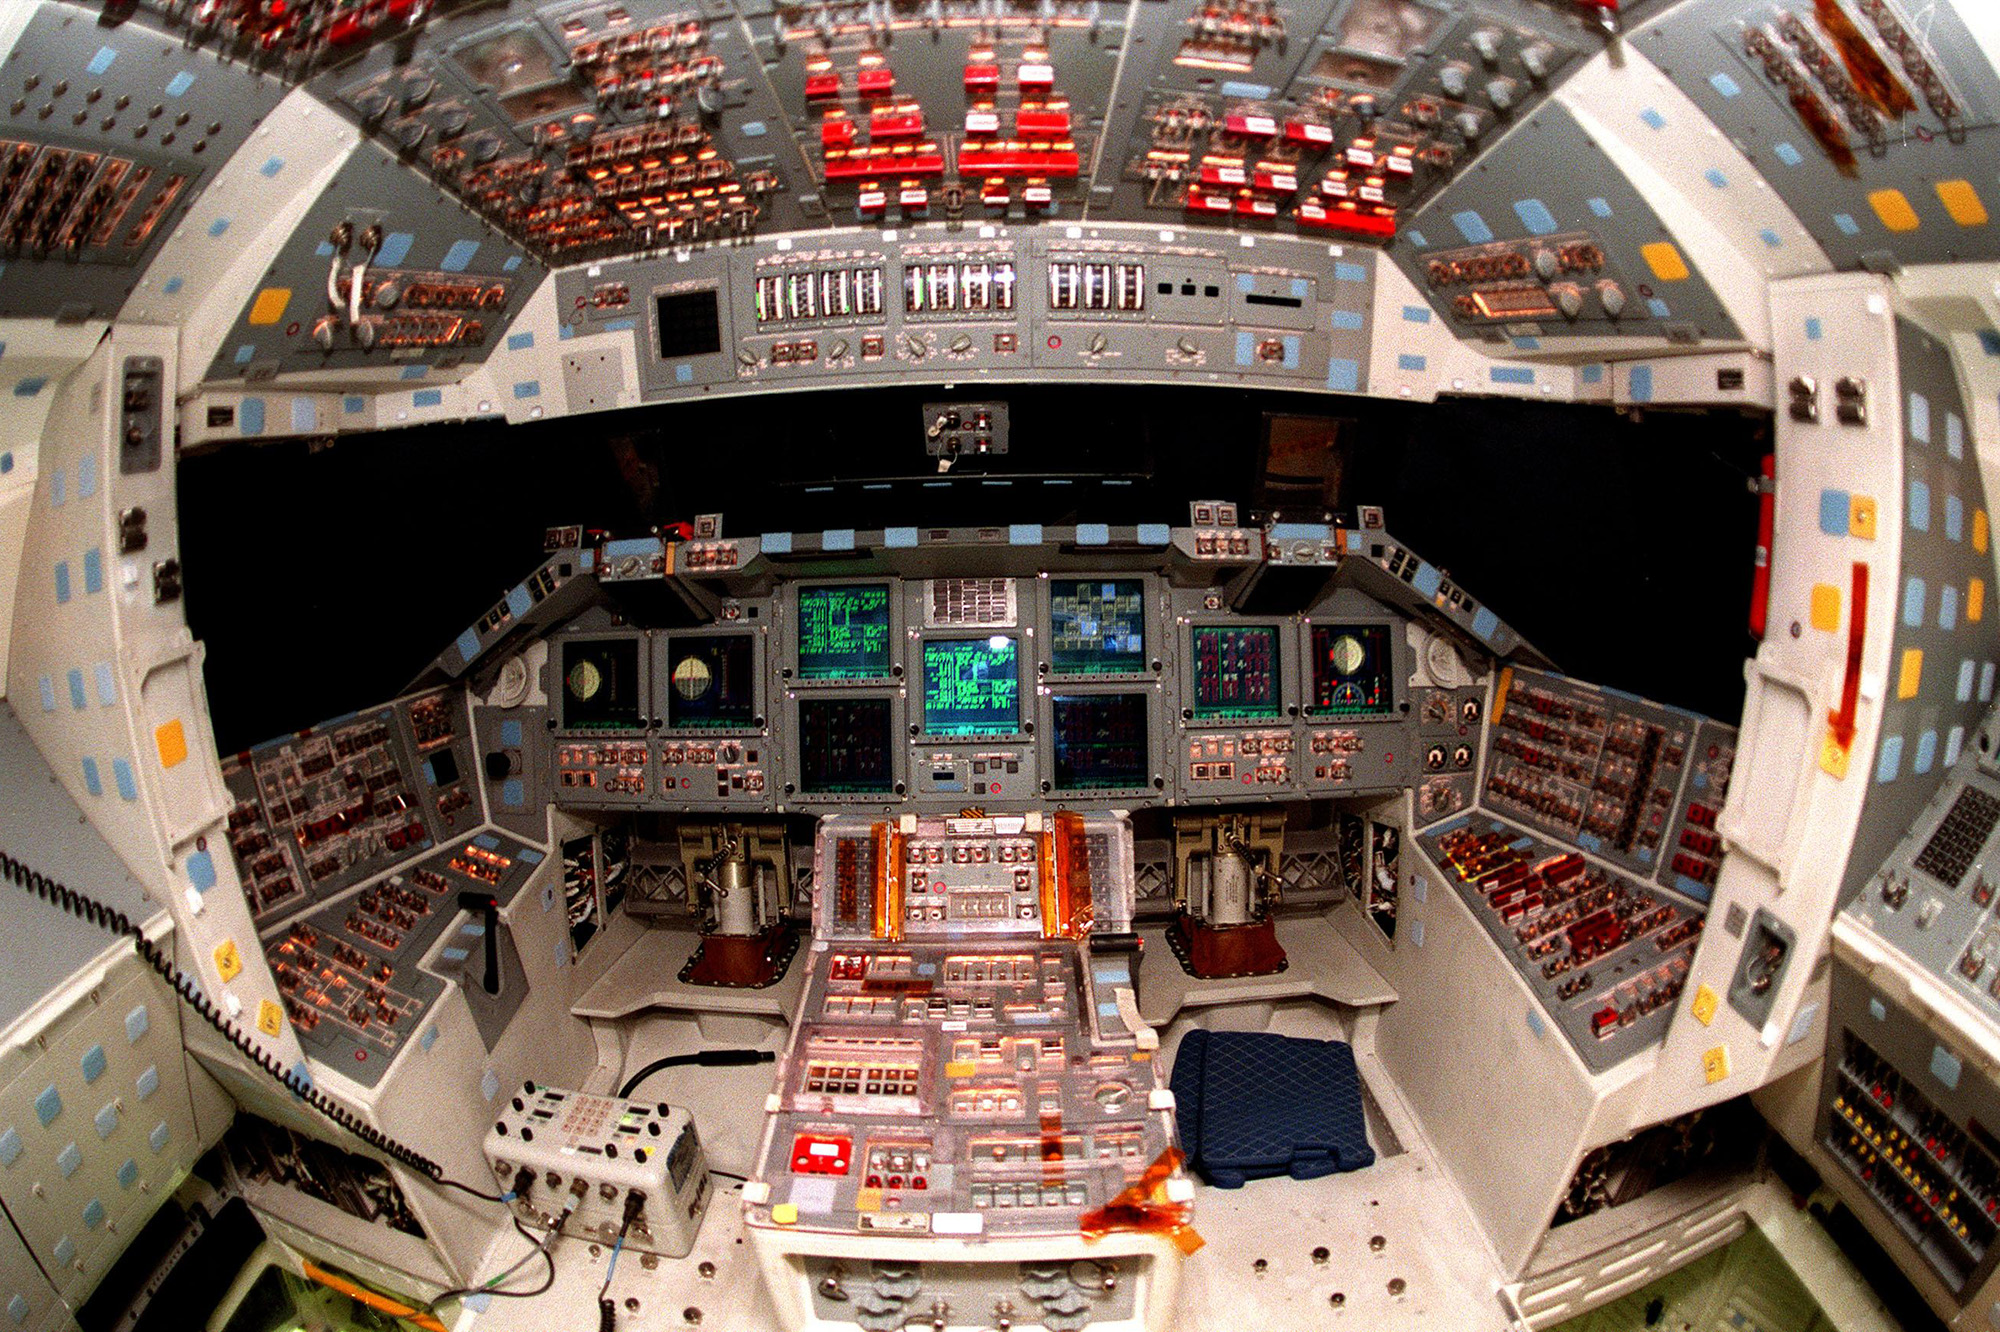 Unutrašnjost Shuttlea Atlantis (Credit: NASA)